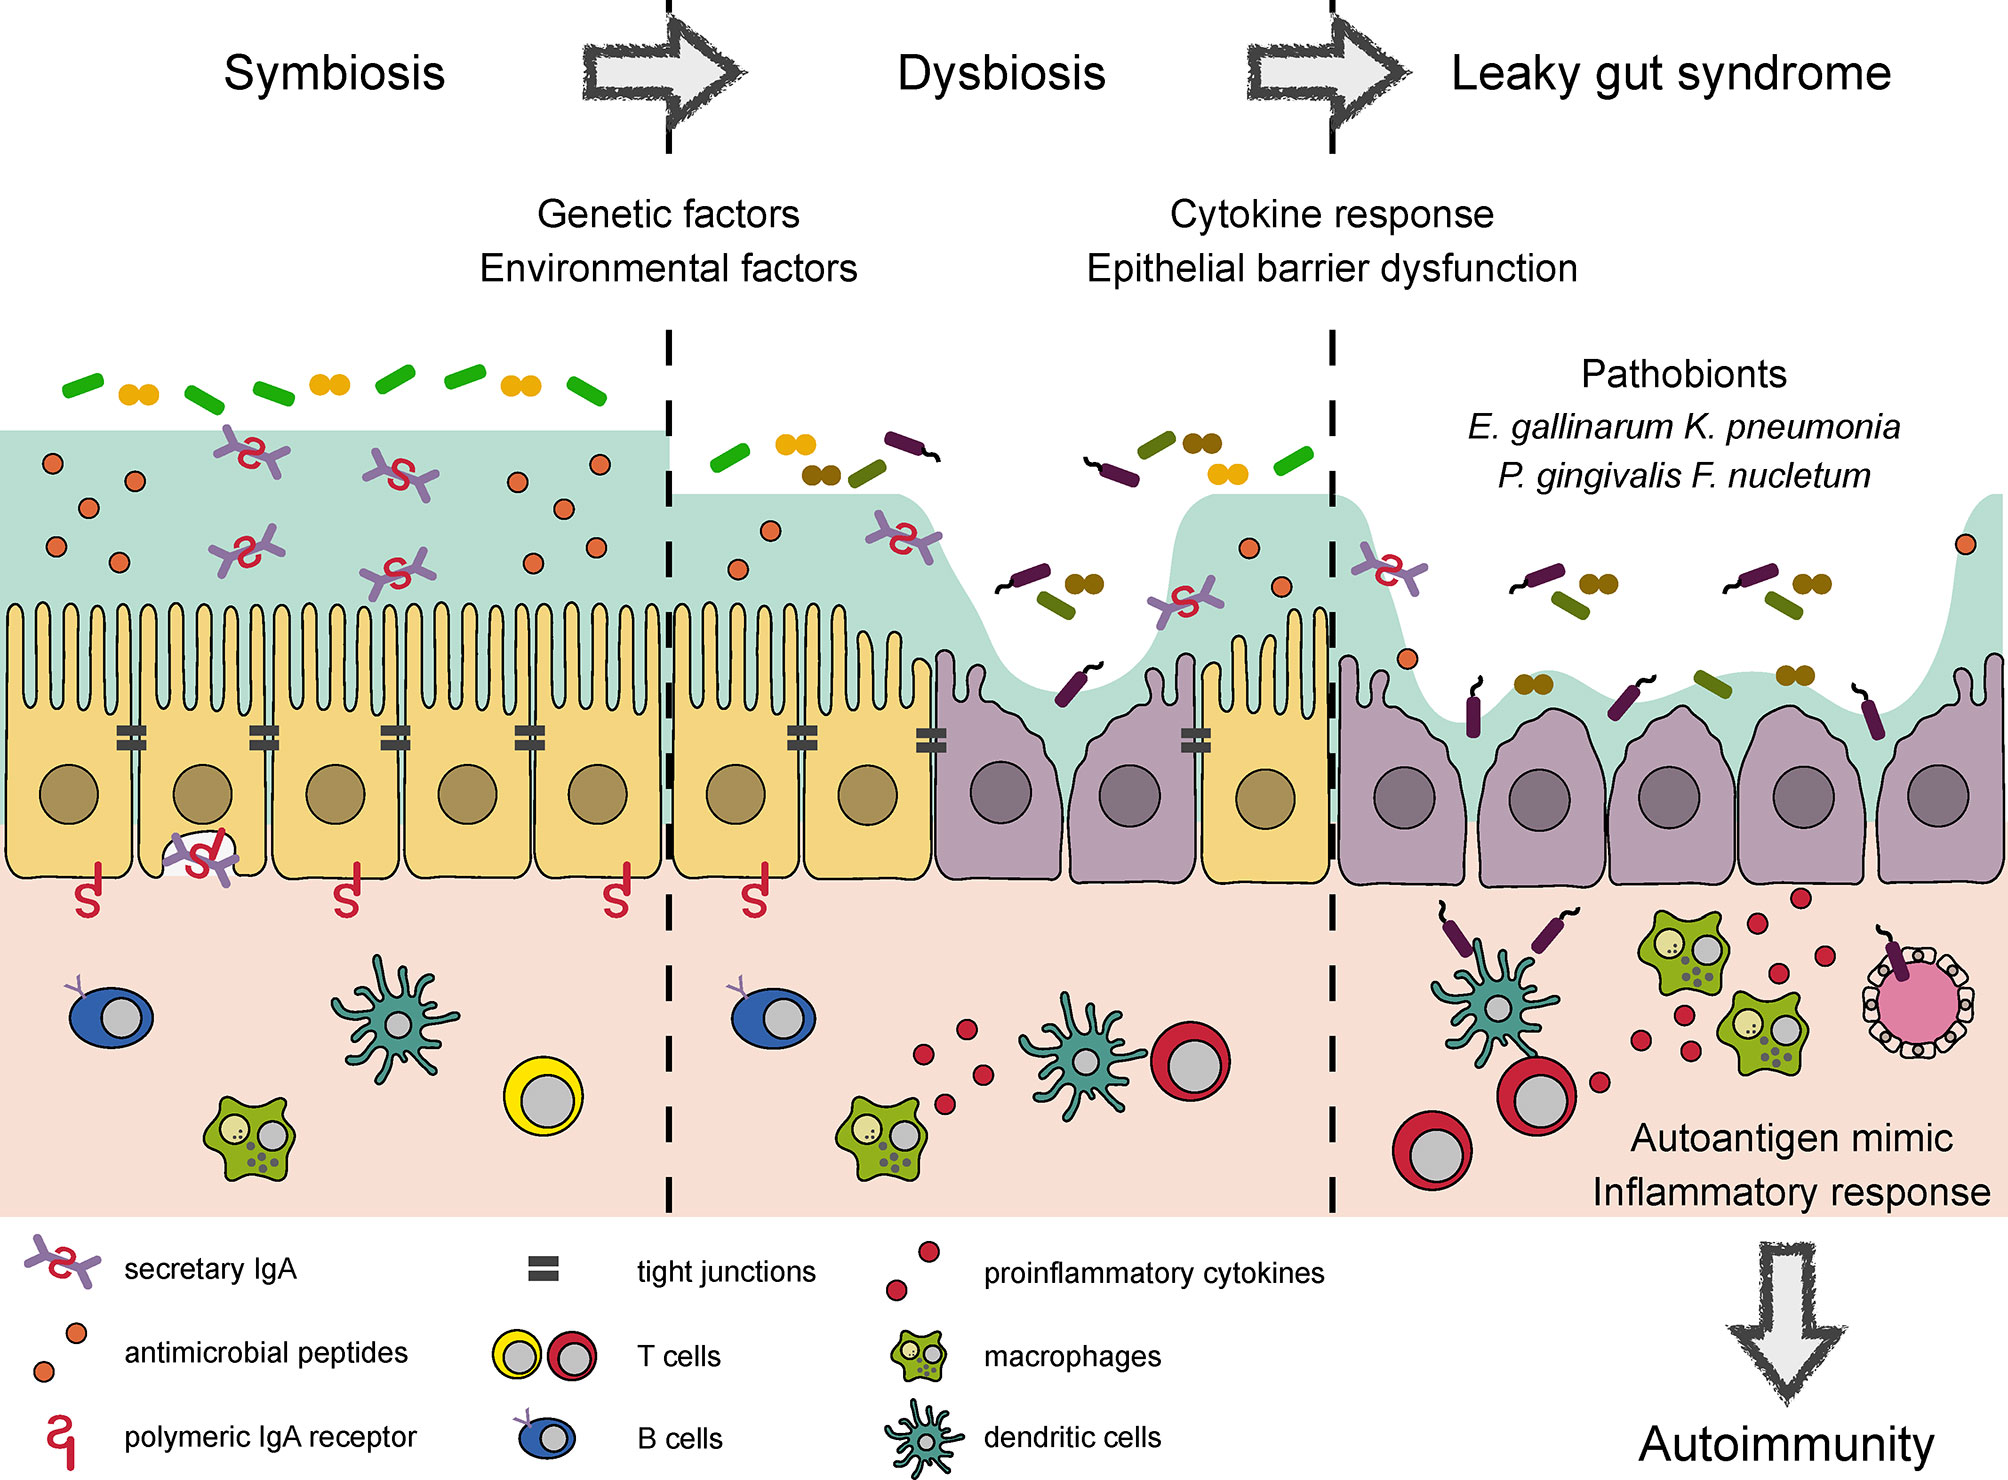 Dysbiosis healing